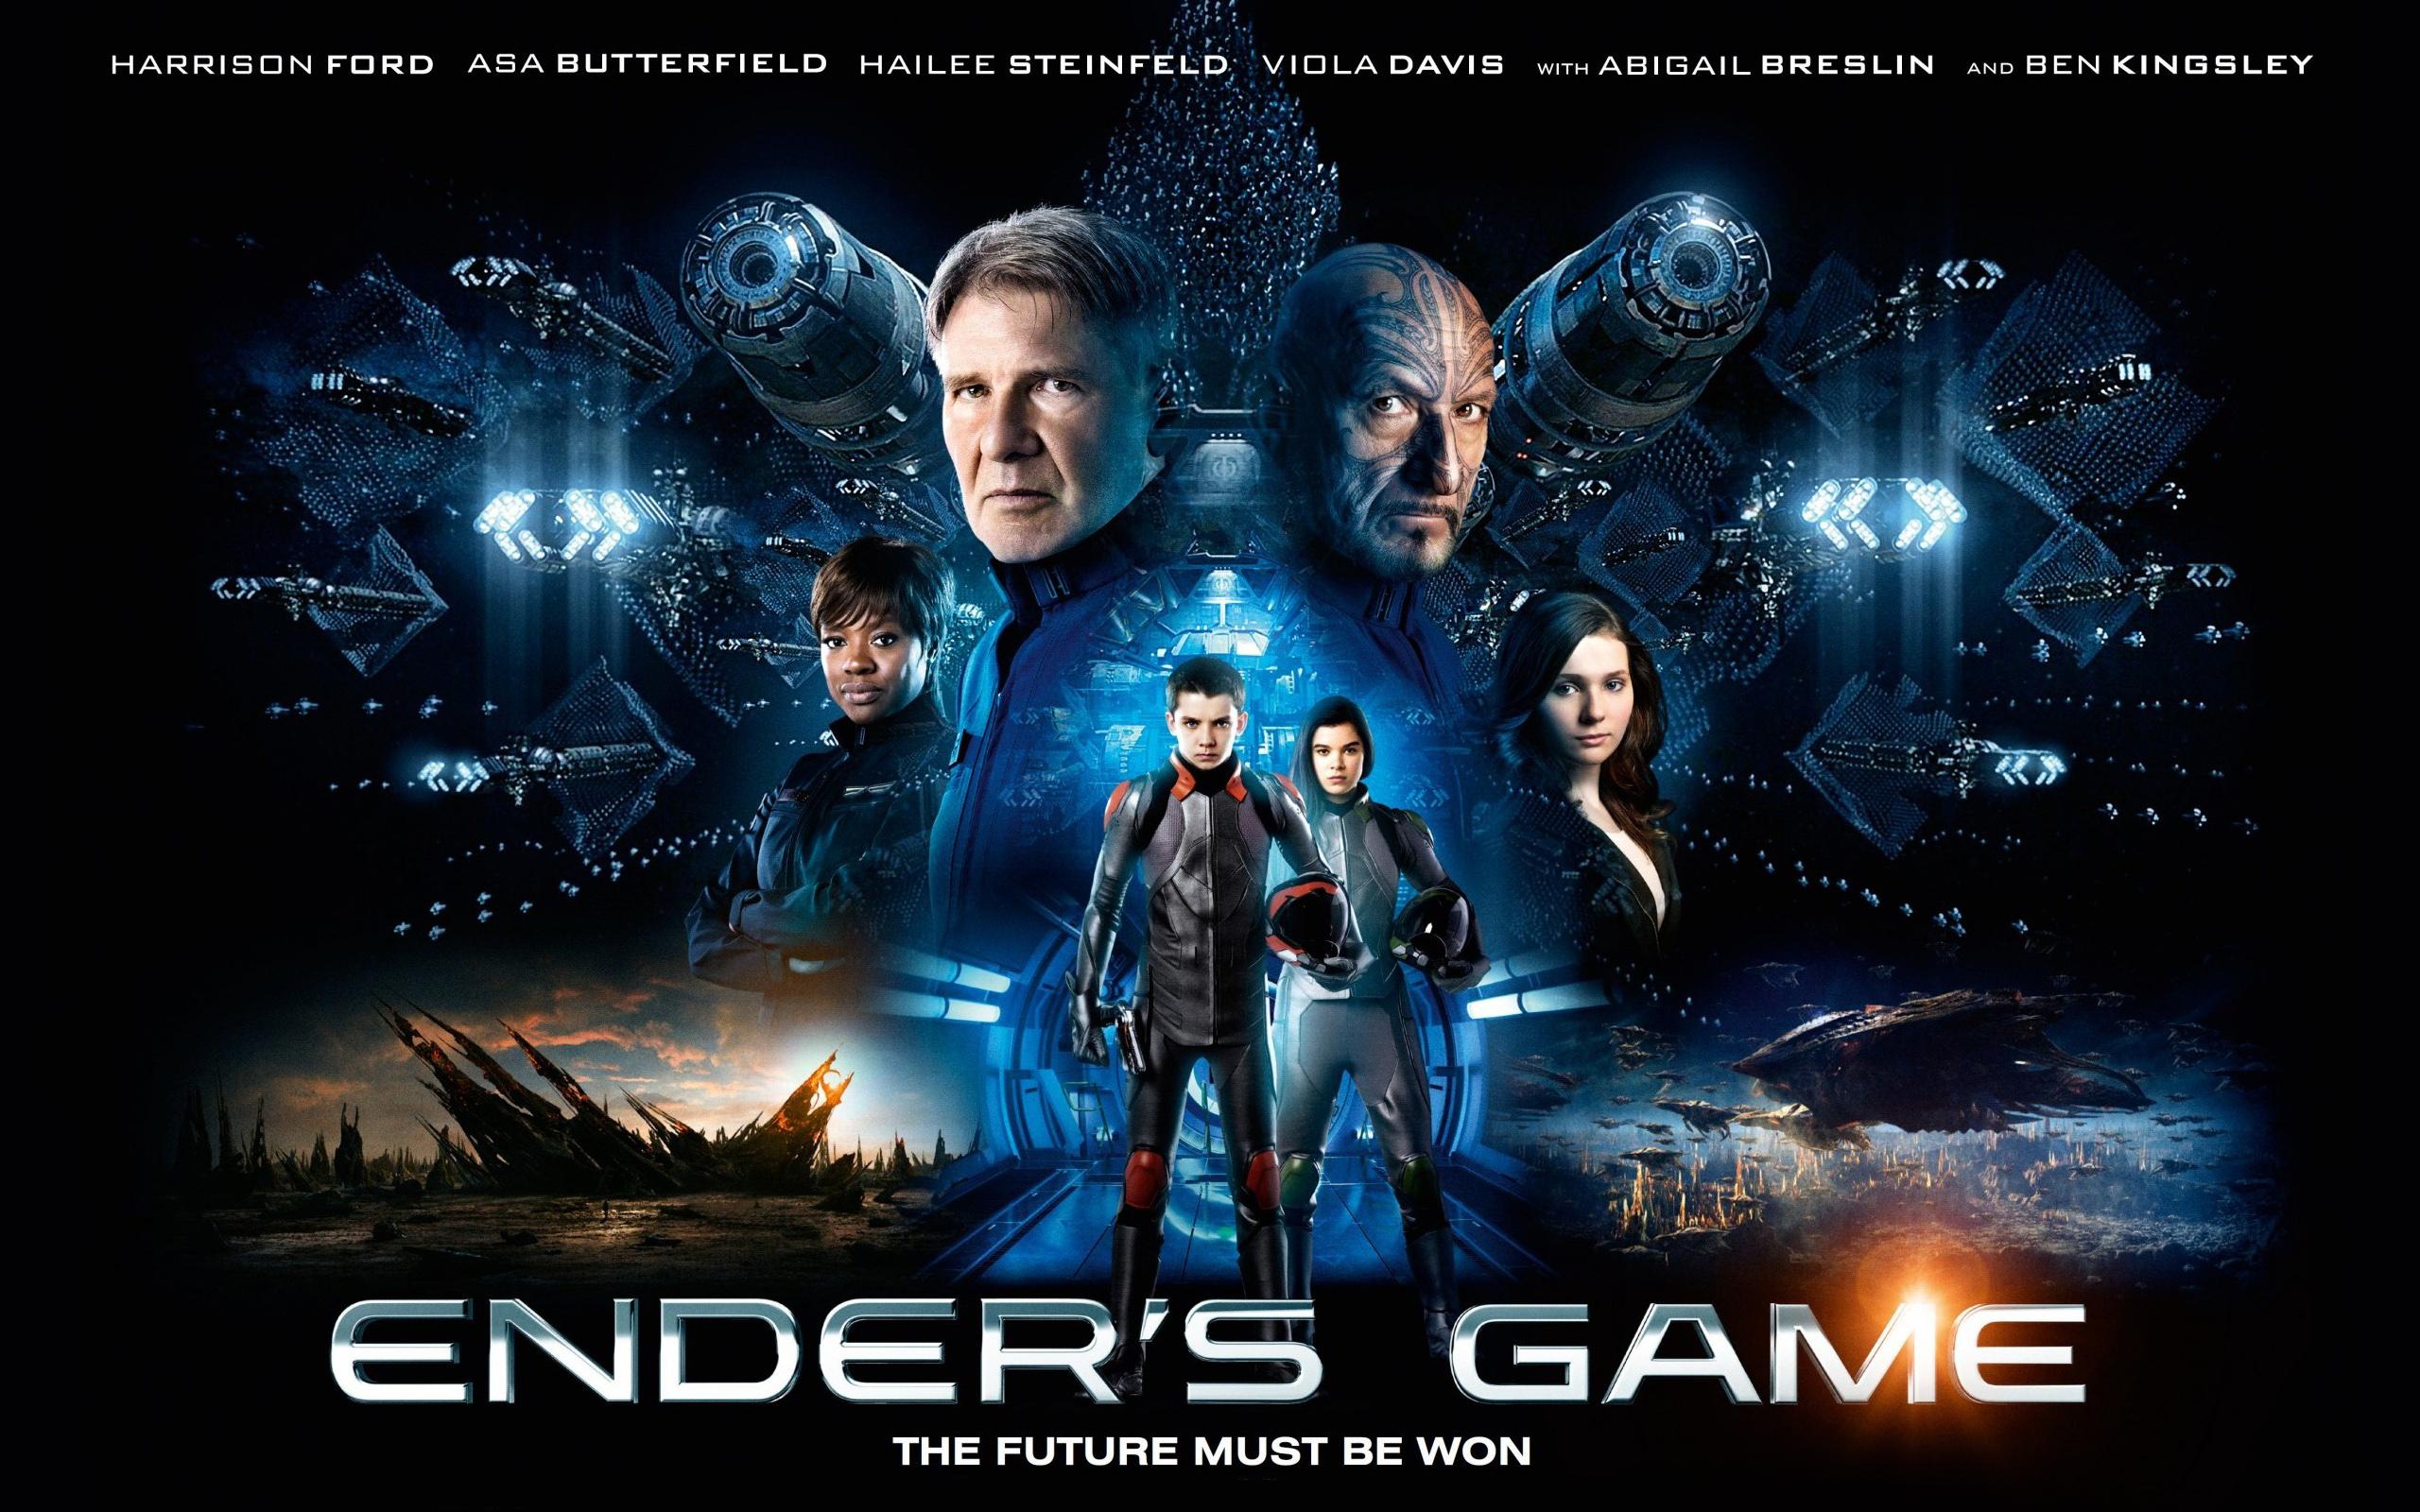 Enders Game 2013 Movie Wallpapers HD Wallpapers 2560x1600